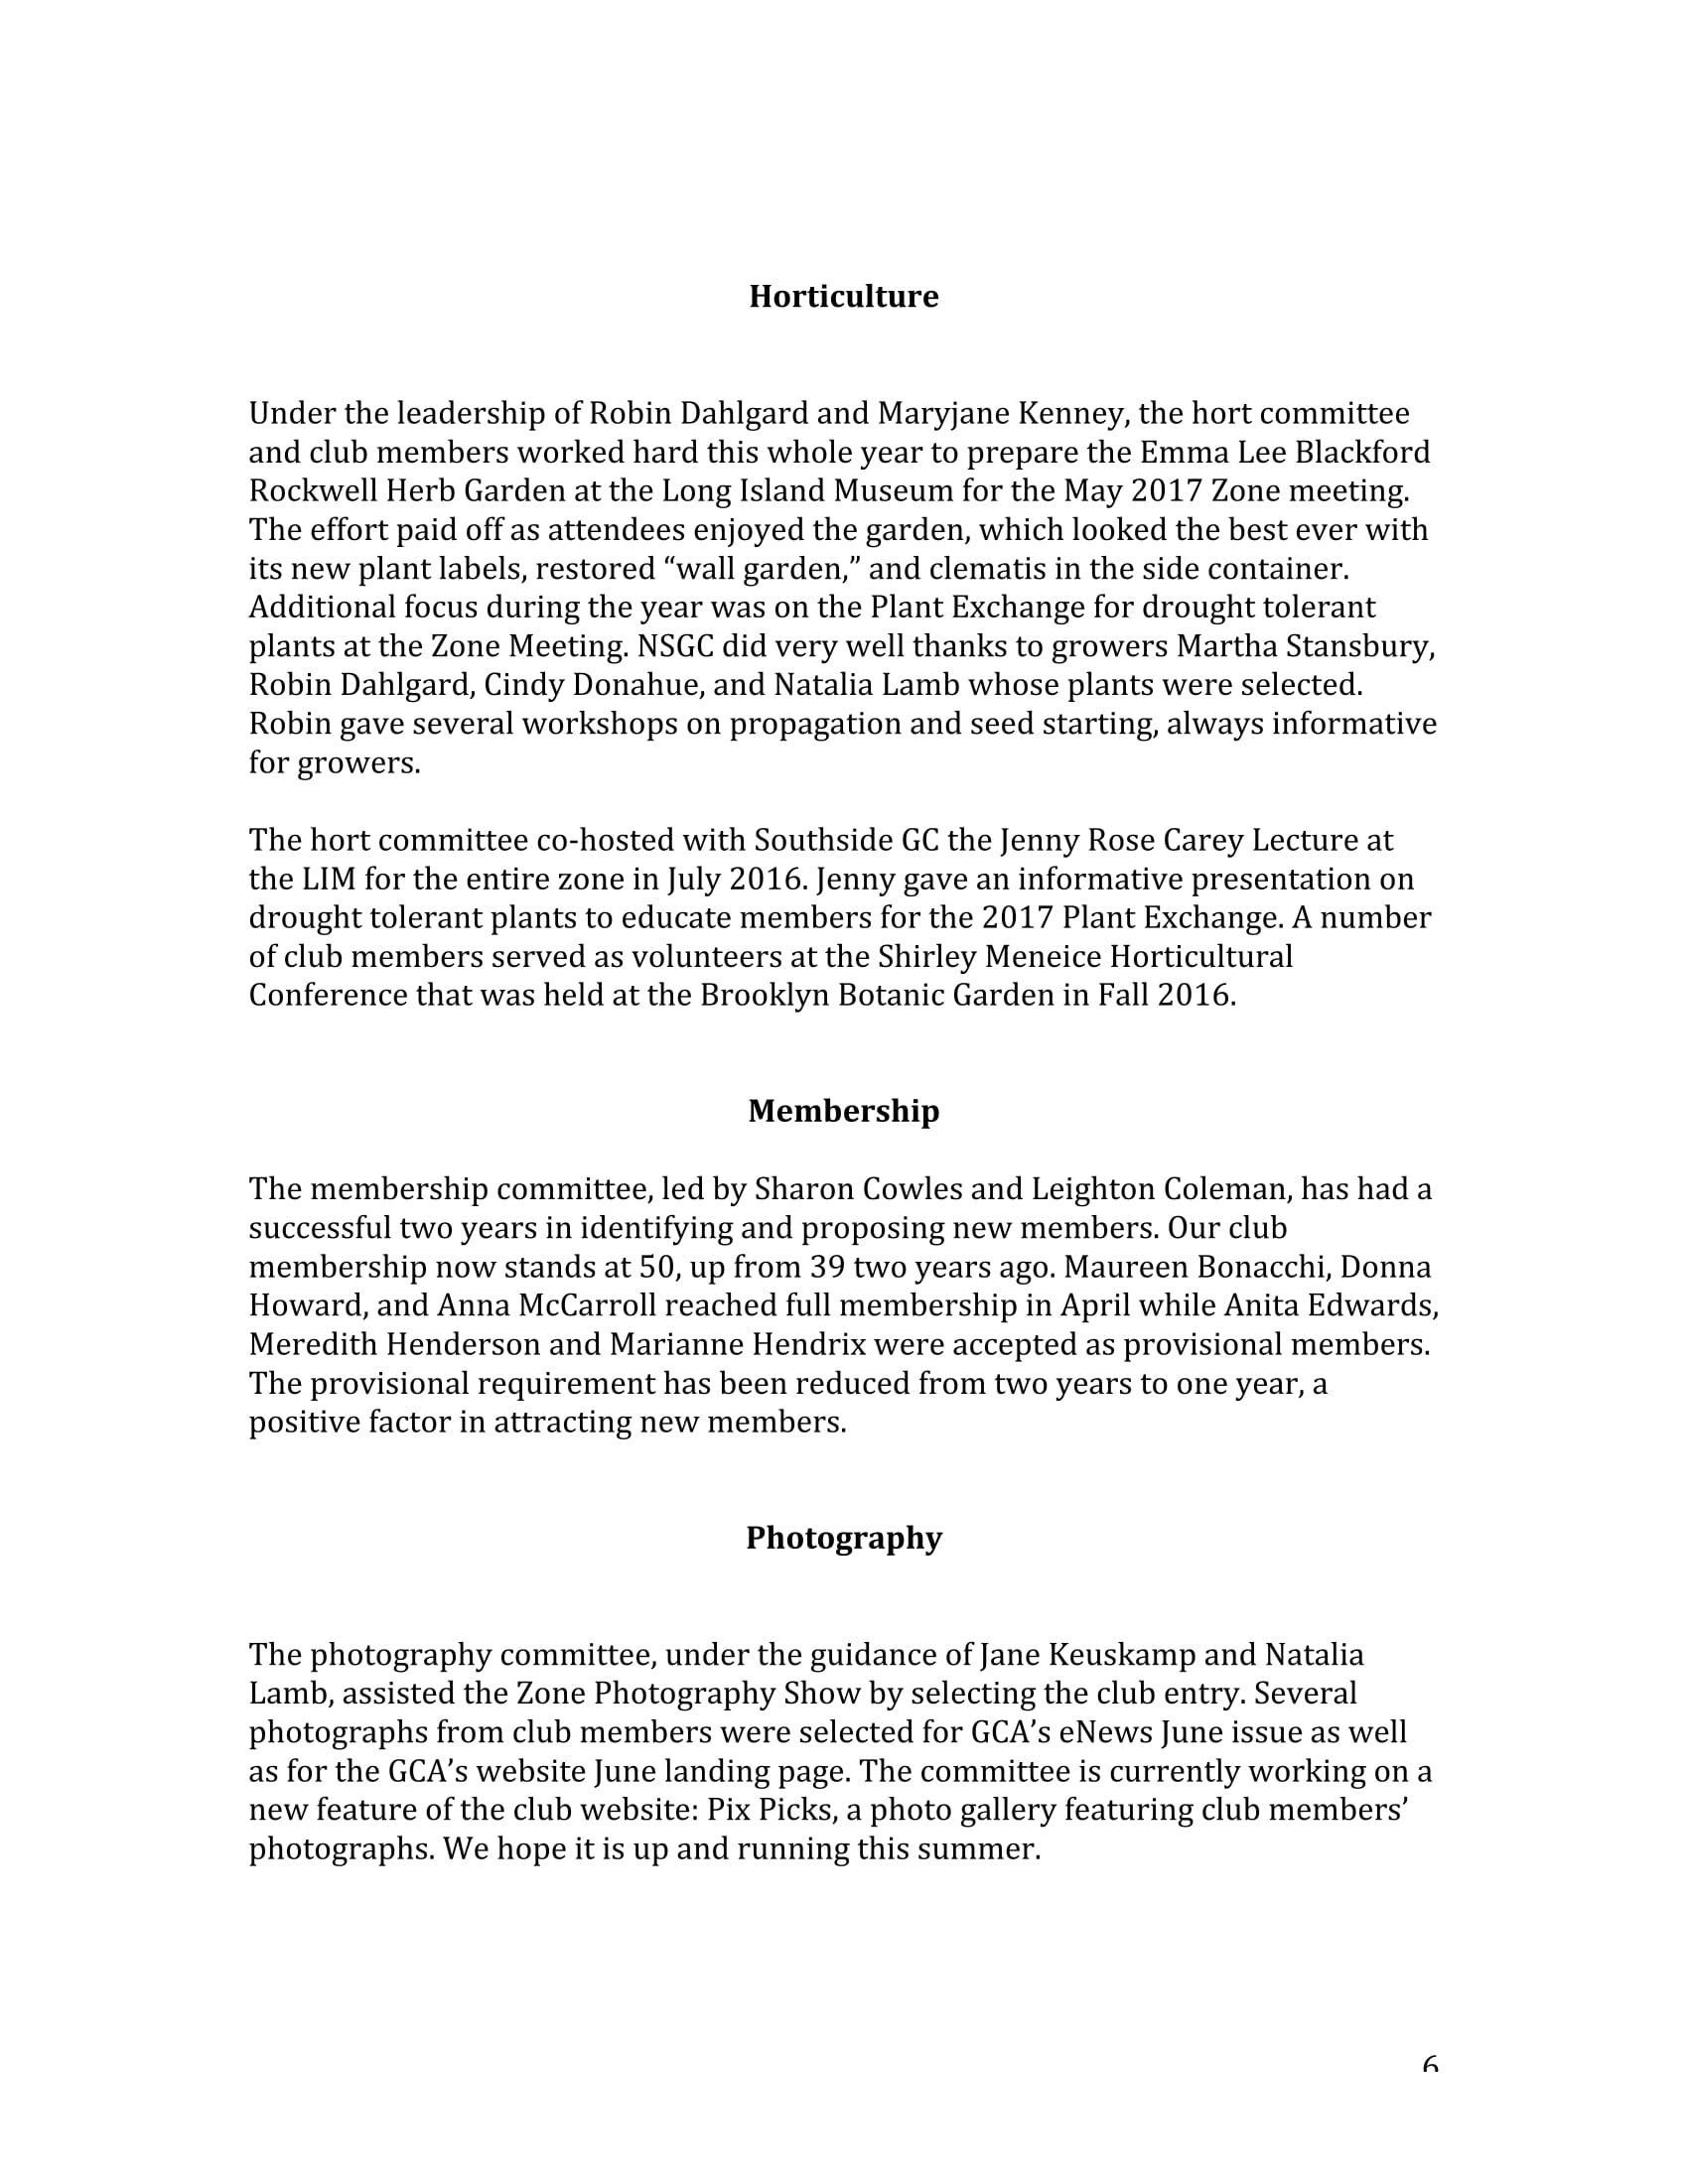 NSGC Annual Report-06.jpg